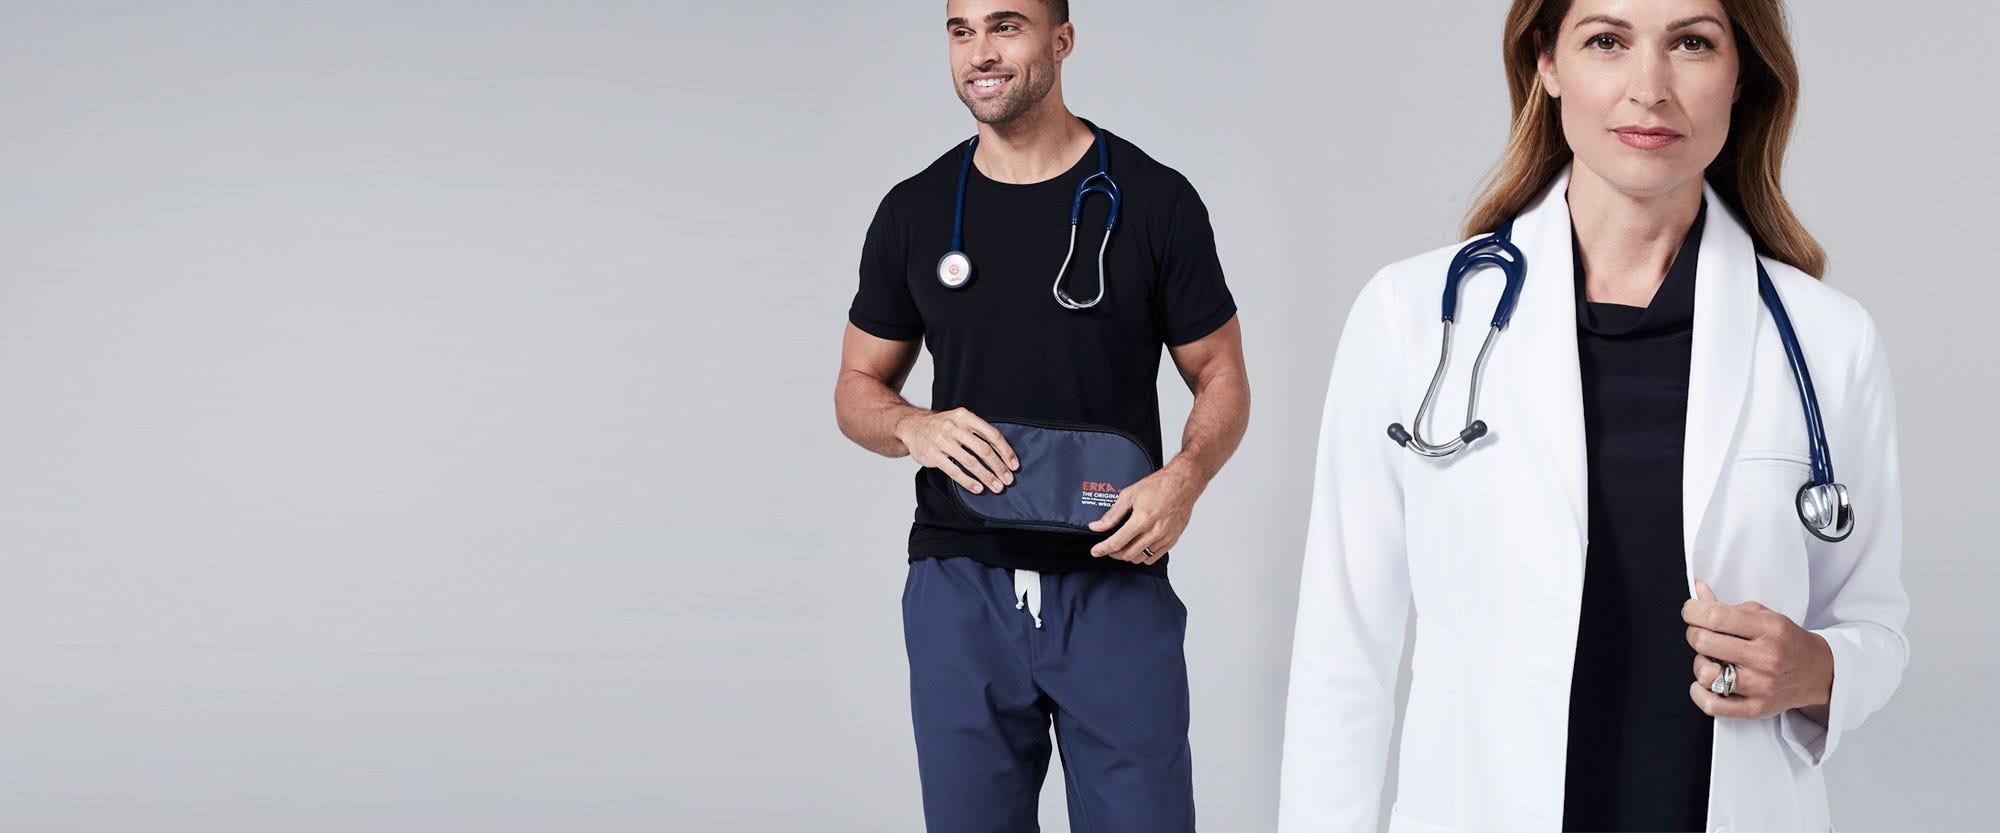 erka stethoscopes